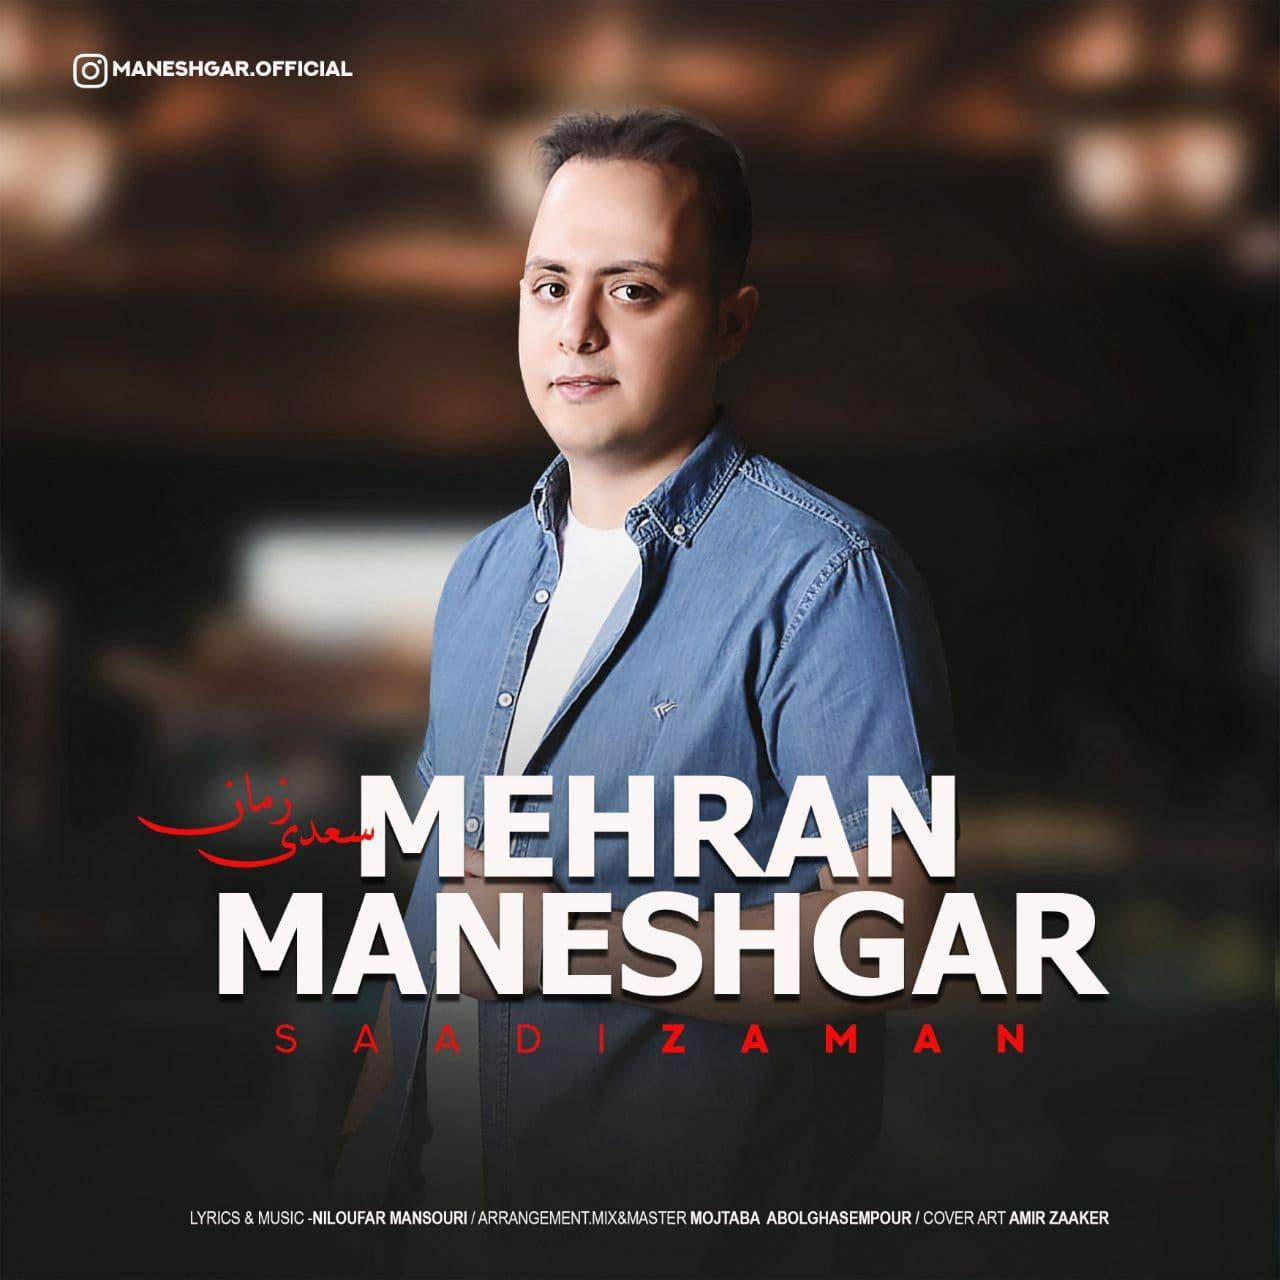 Mehran Maneshgar – Saadi Zaman